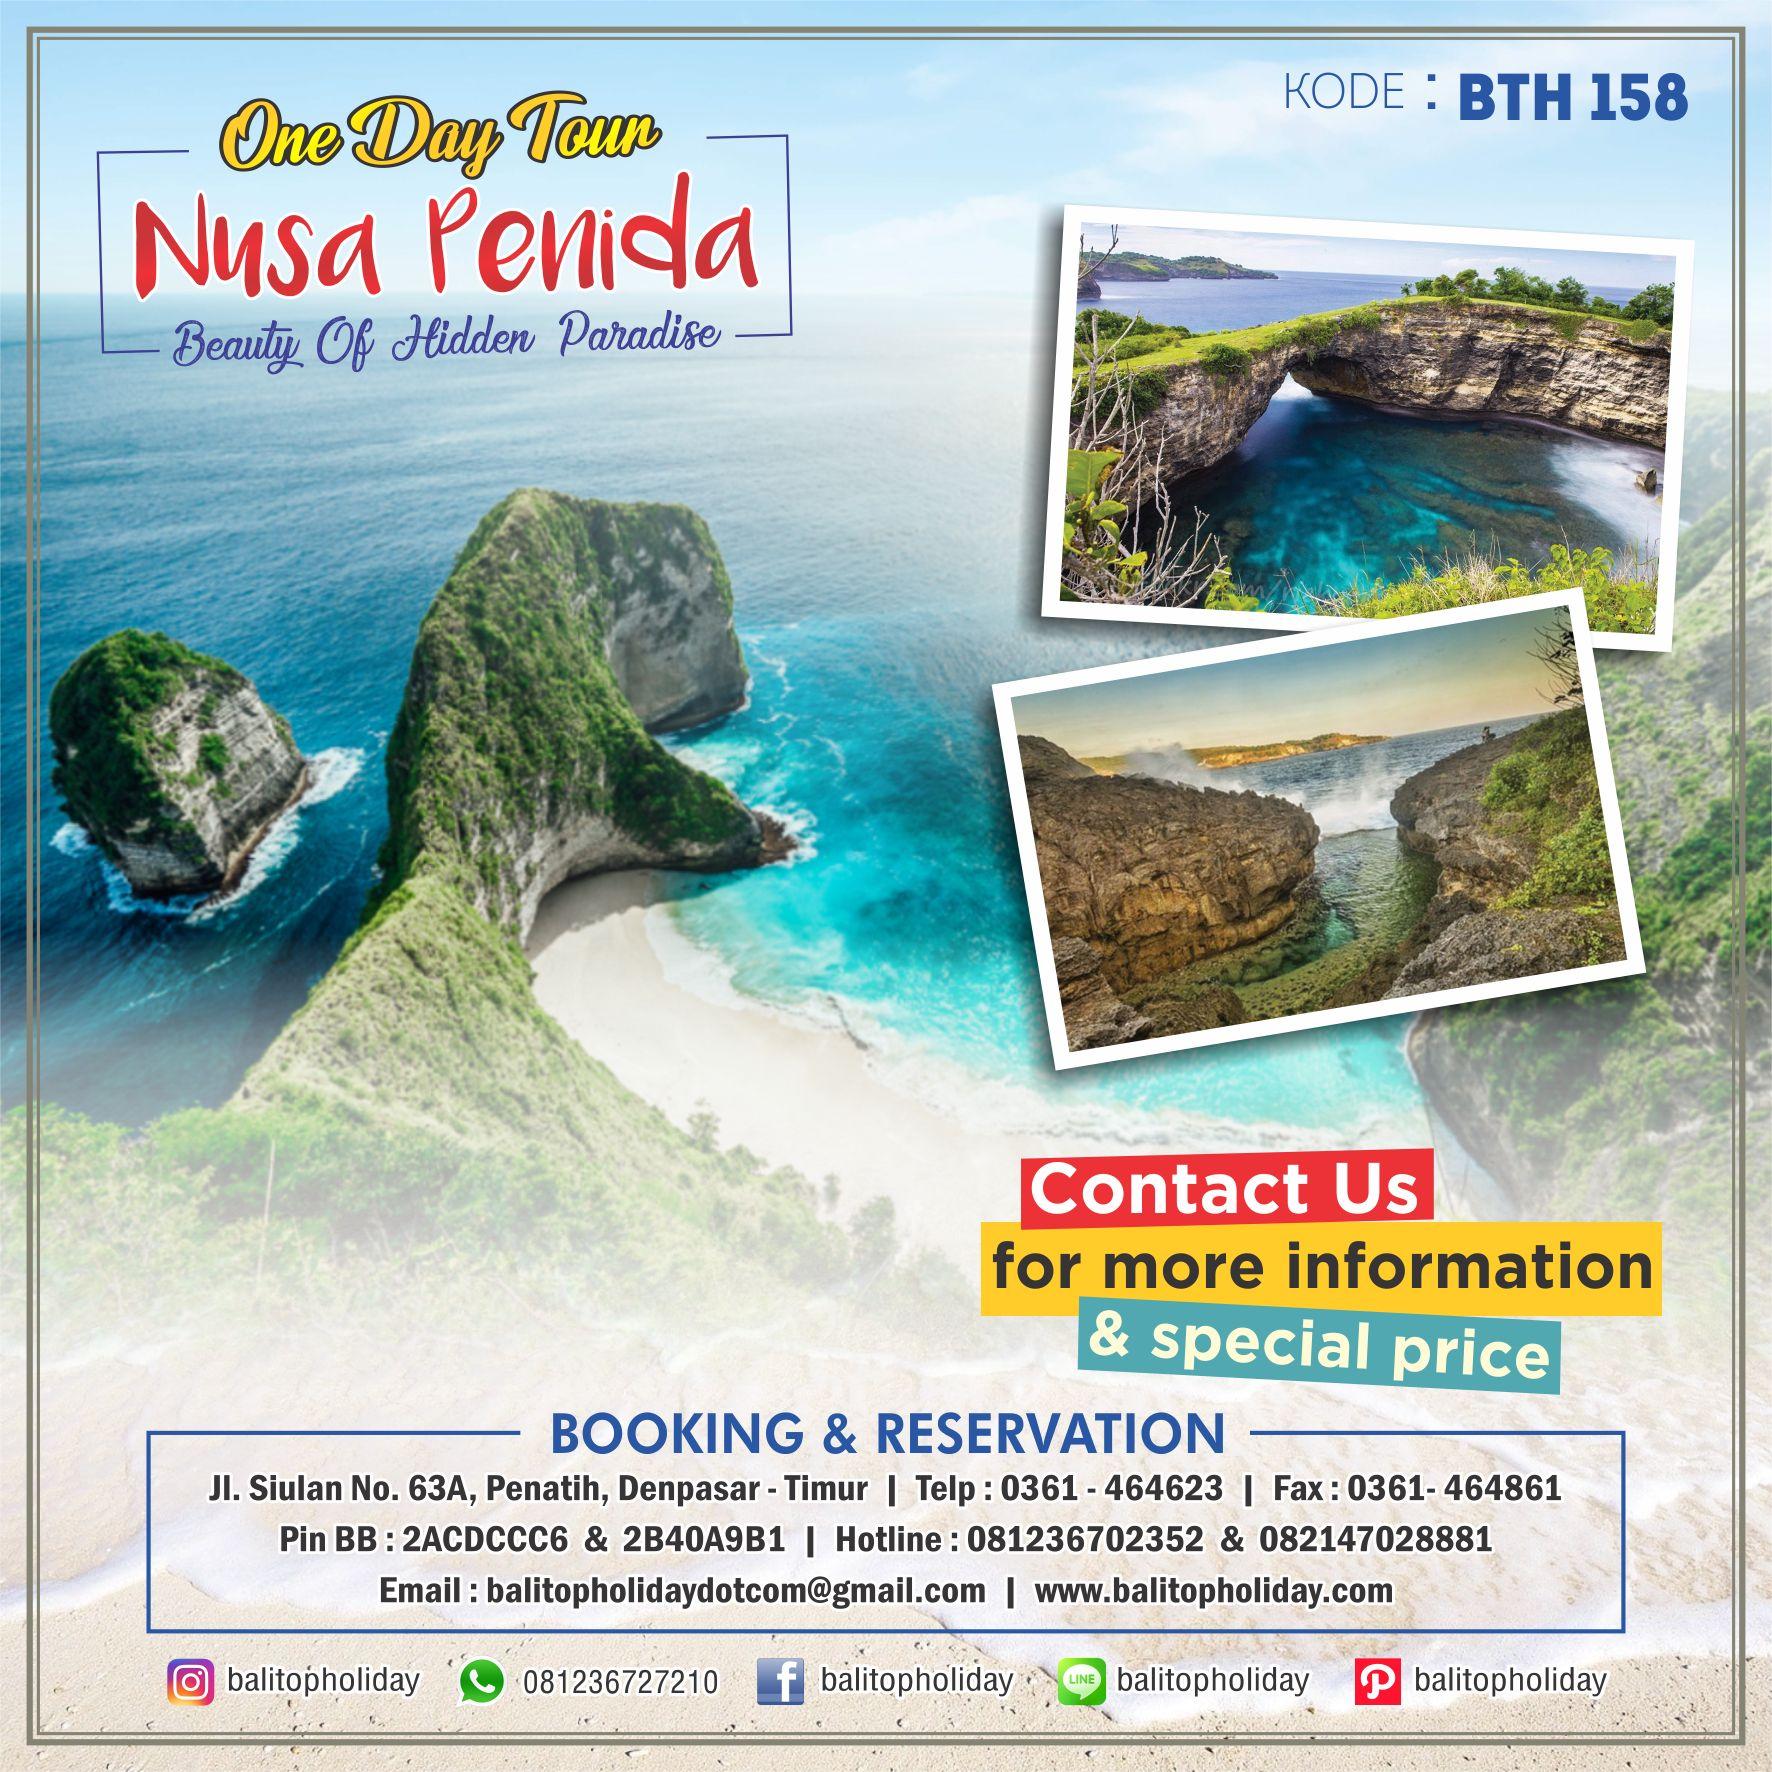 nusa penida one day tour BTH 158